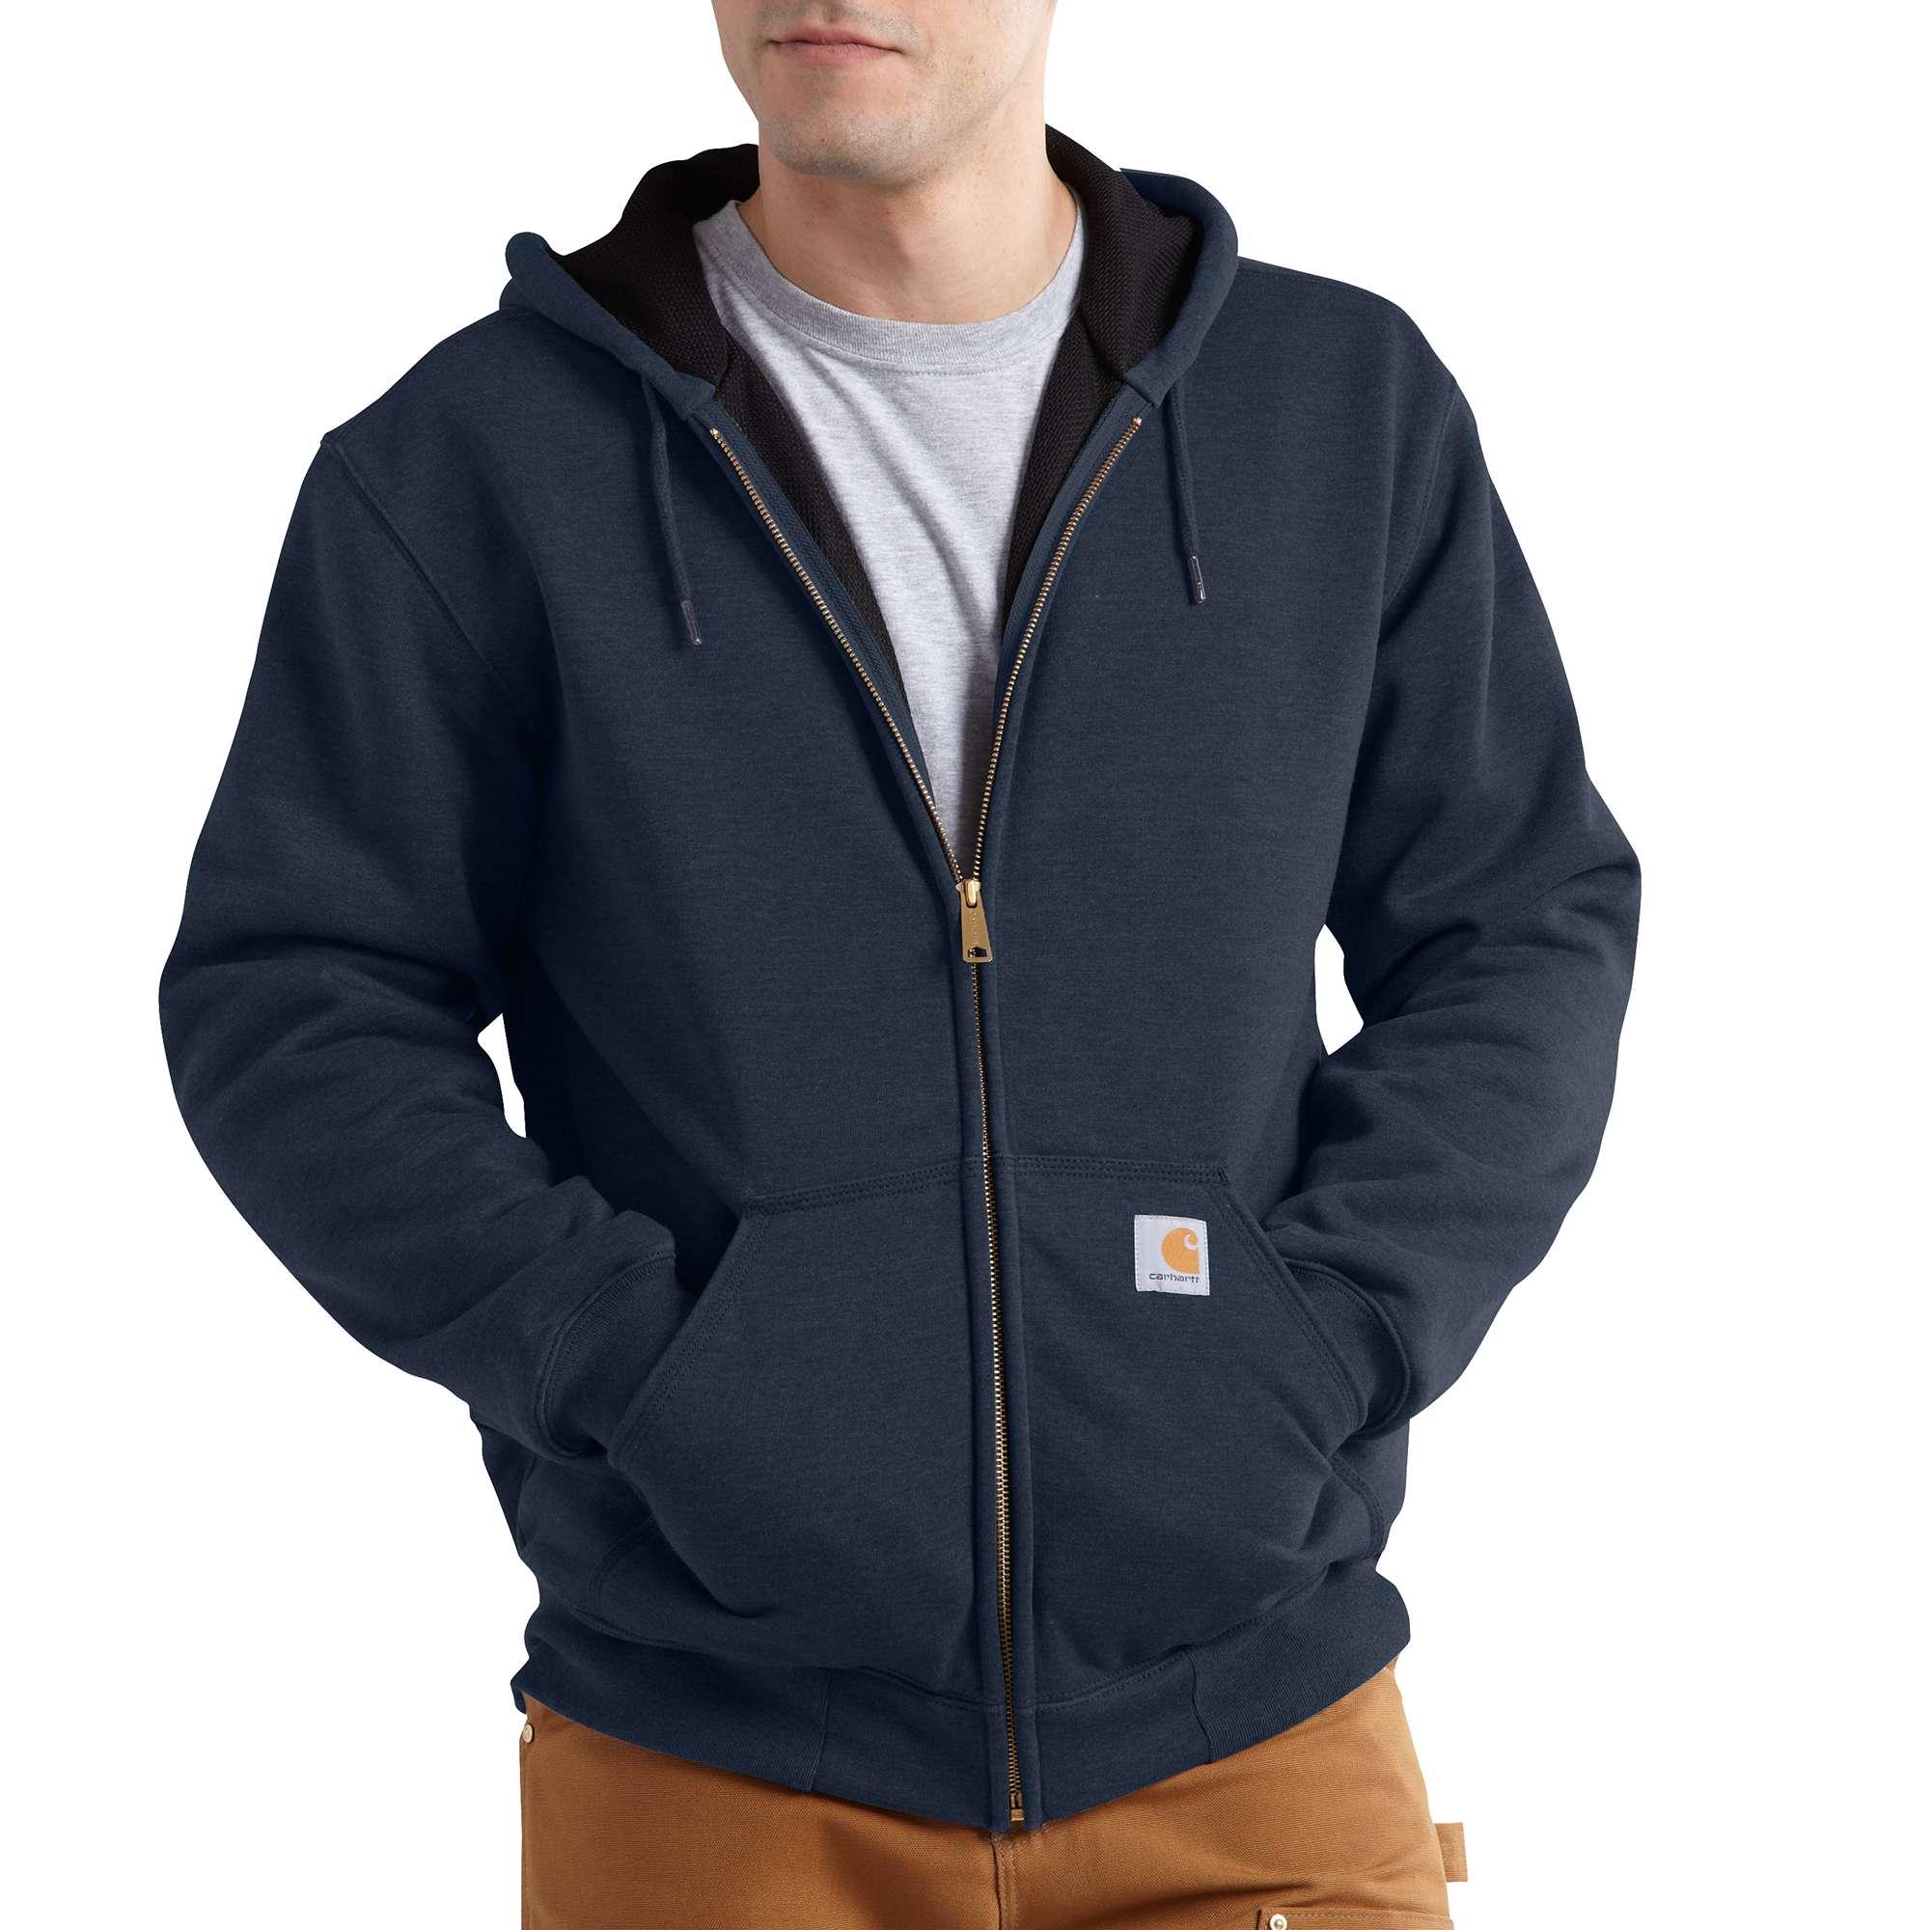 Carhartt Rain Defender Rutland Thermal-lined Hooded Zip-front Sweatshirt